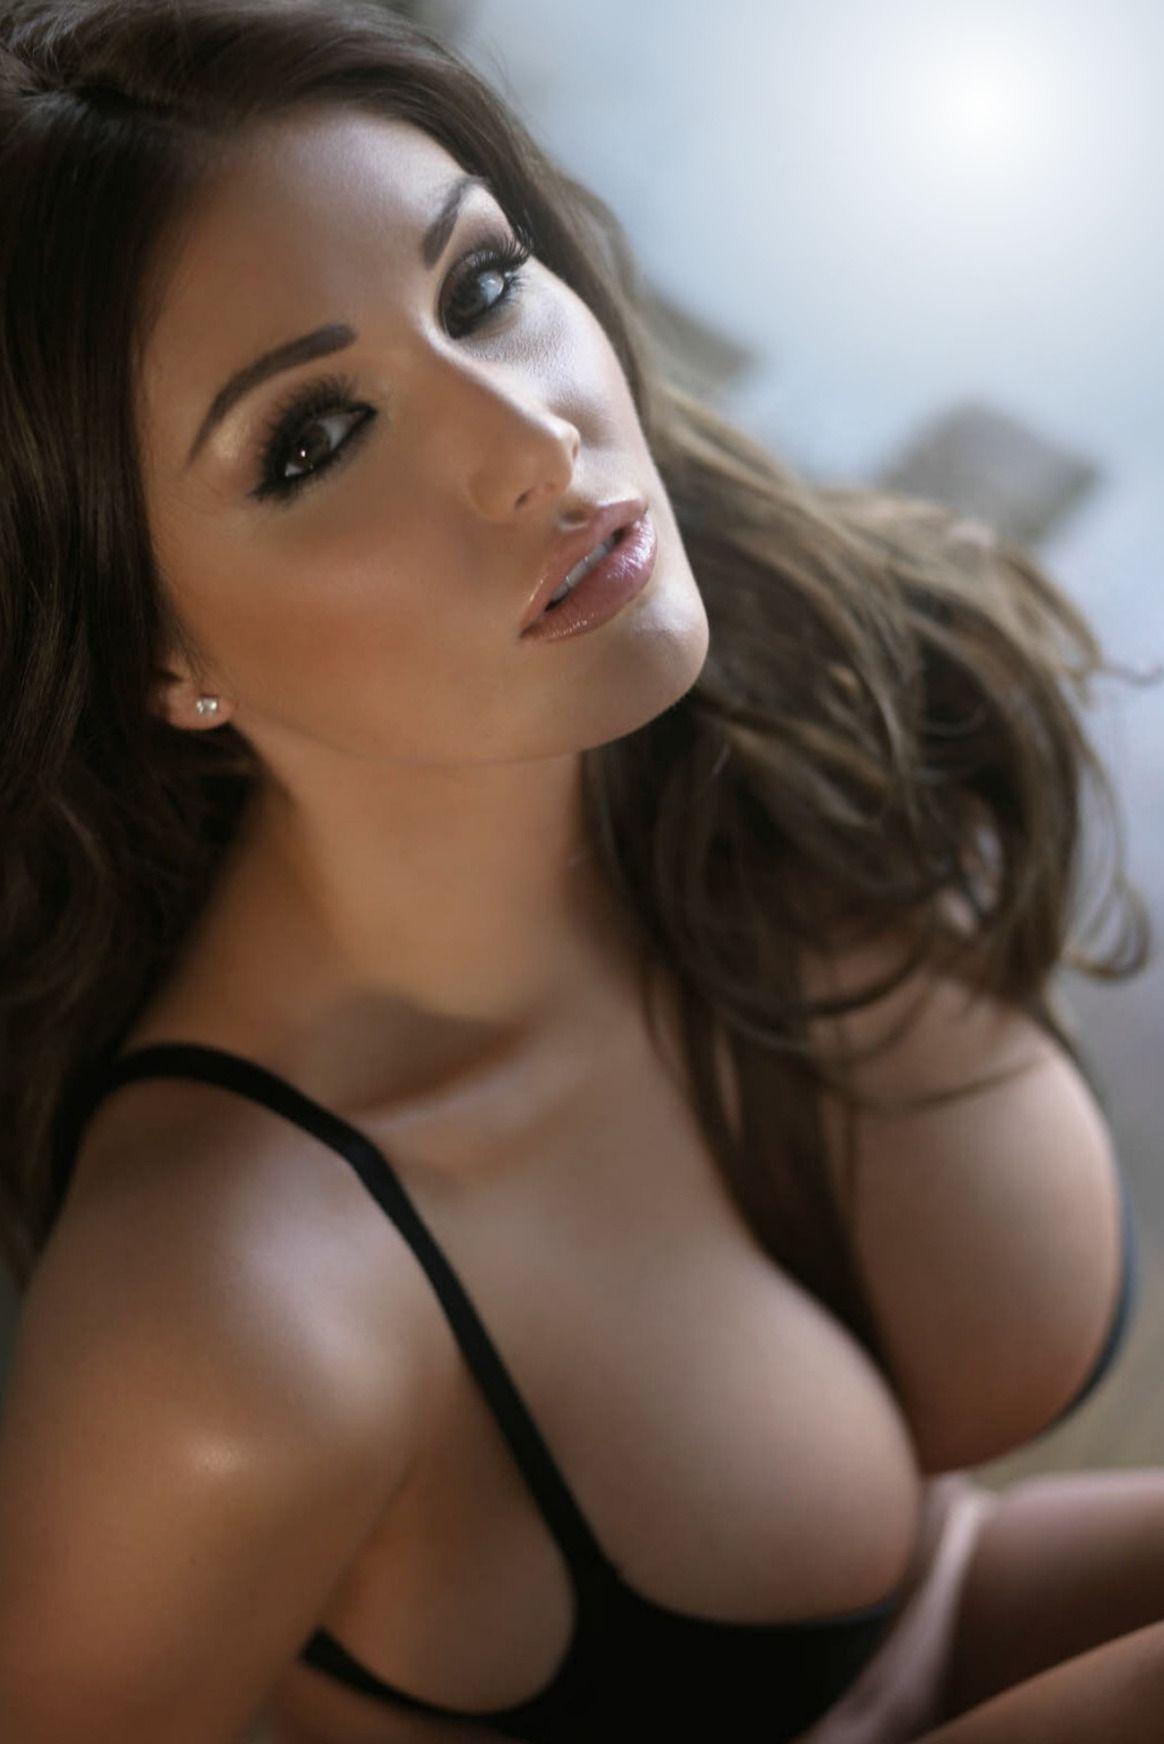 the best of beautiful women   beautiful woman & girls   pinterest